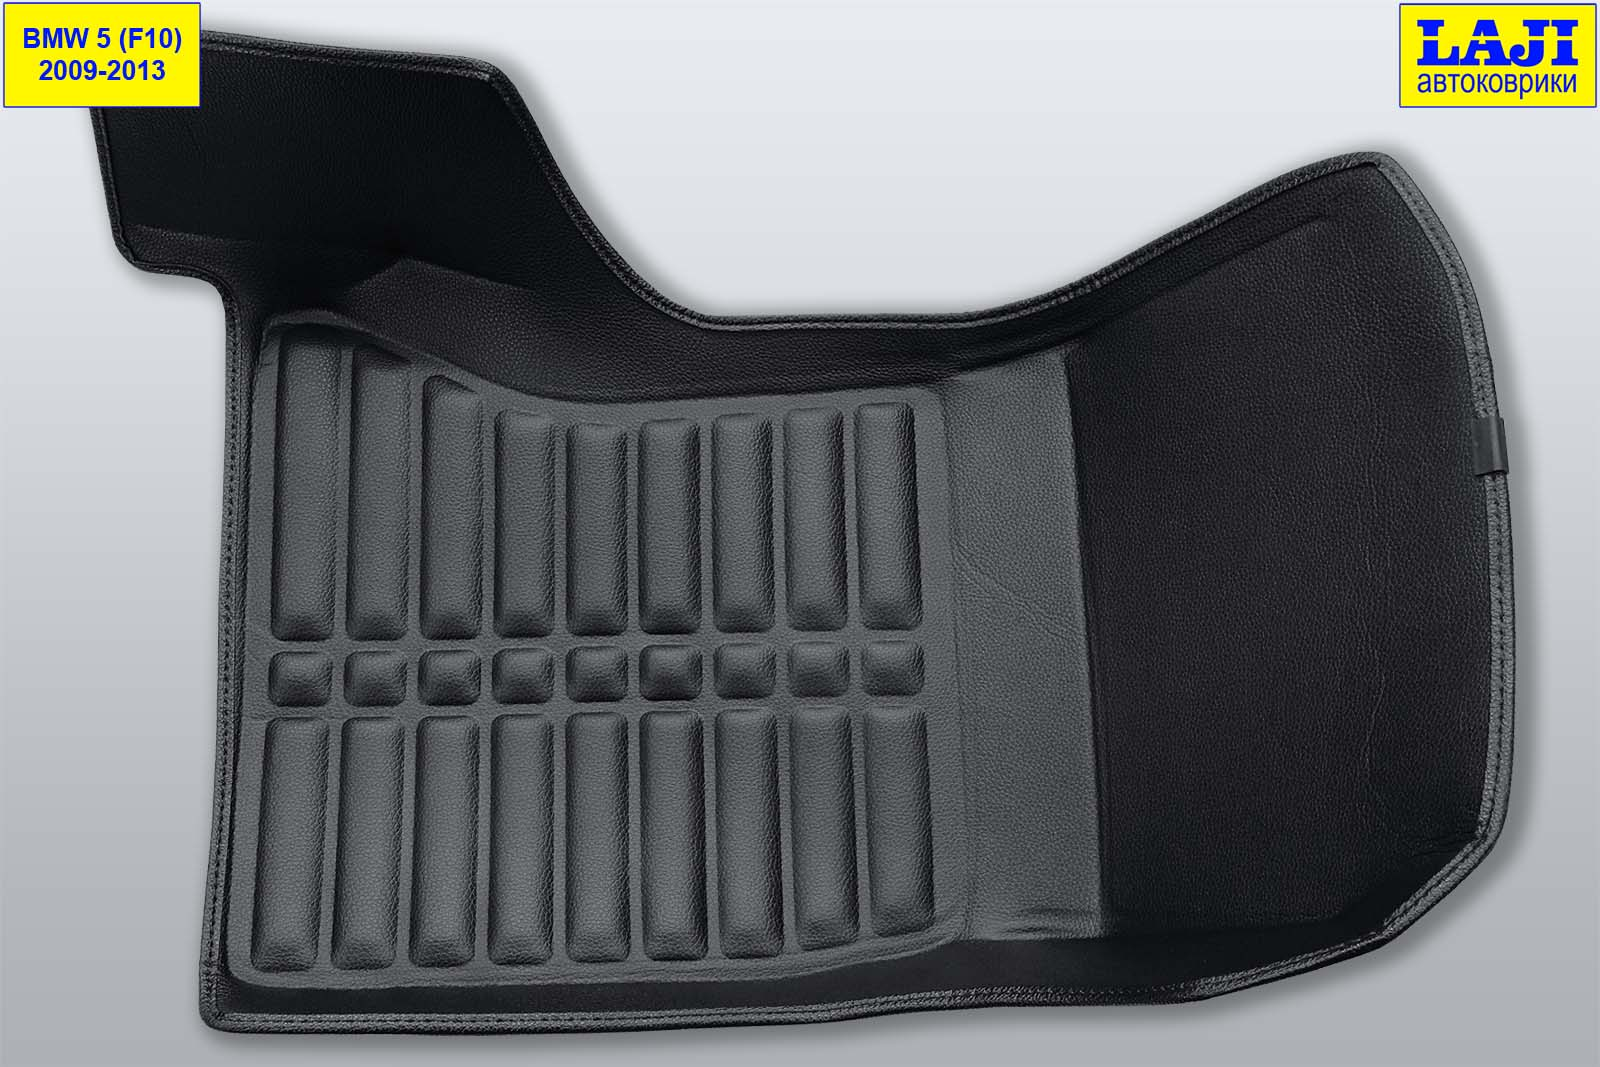 5D коврики в салон BMW 5 серии F10 2009-2013 4